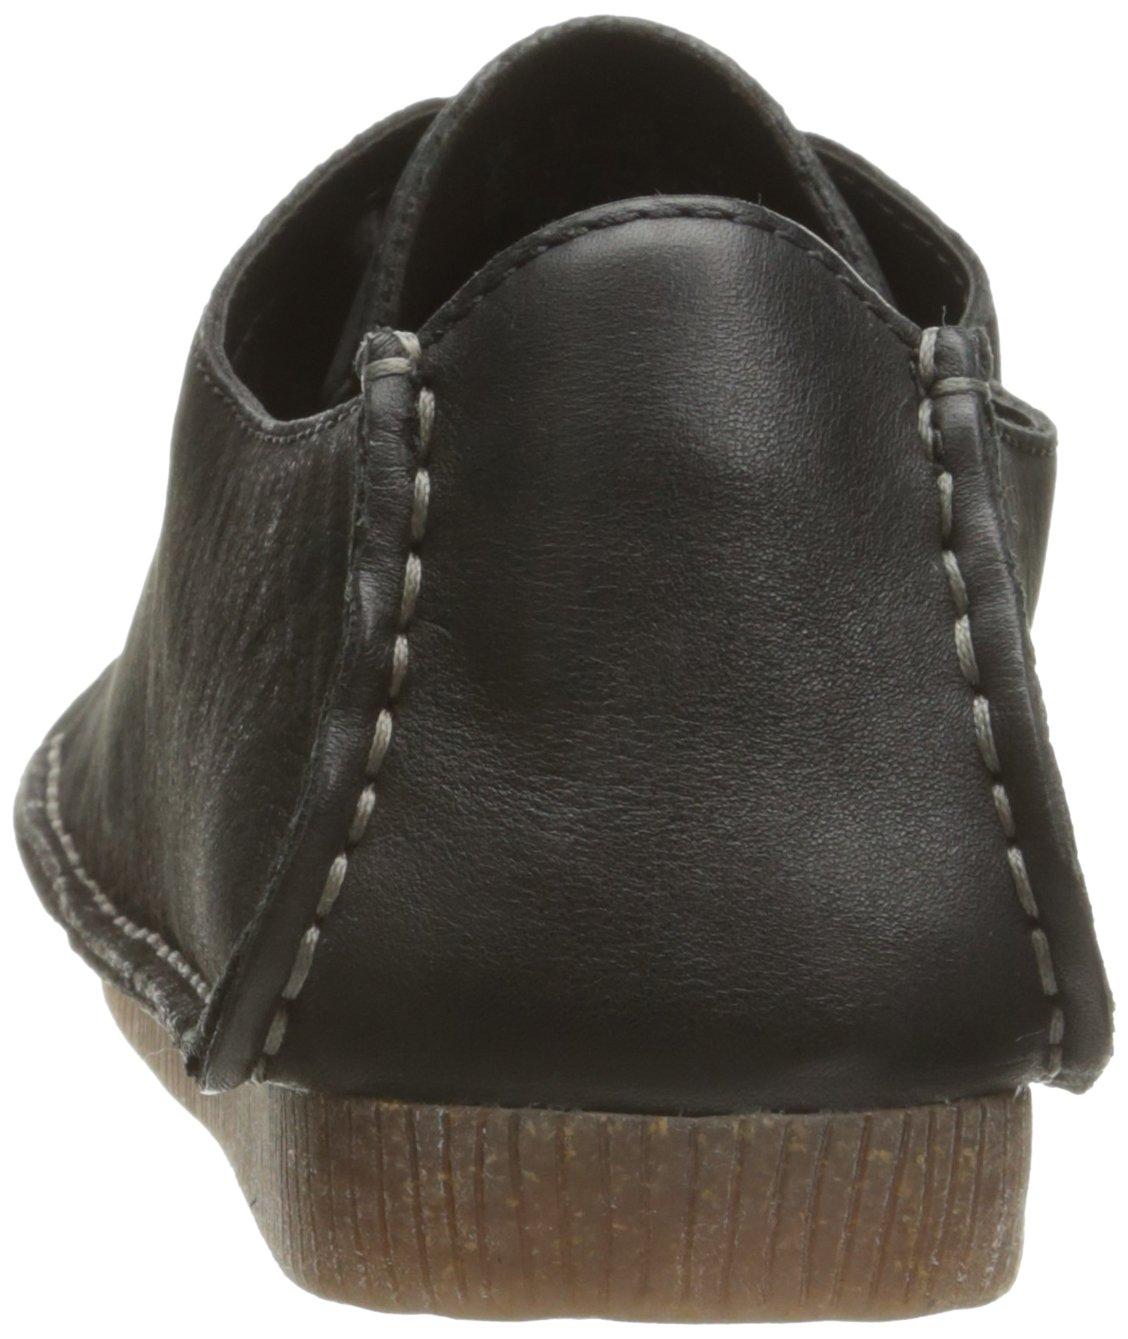 CLARKS Women's Janey Mae Oxford B01IPVFYBU 5.5 B(M) US|Black Nubuck